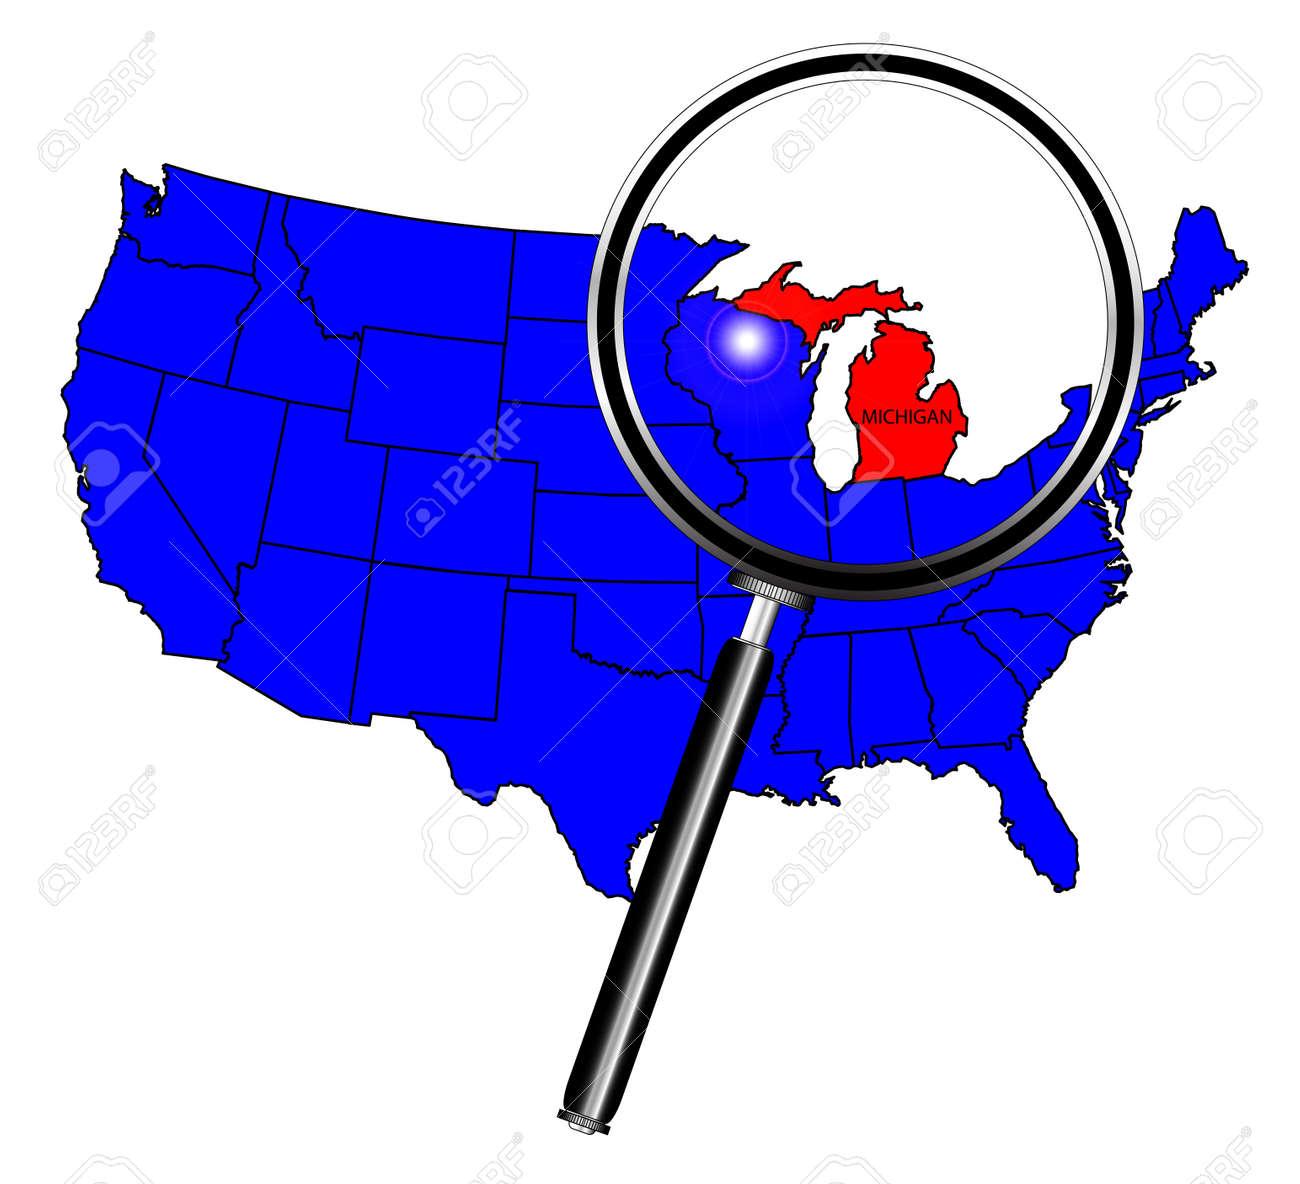 Us Map Michigan Globalinterco - Us map indinapolia